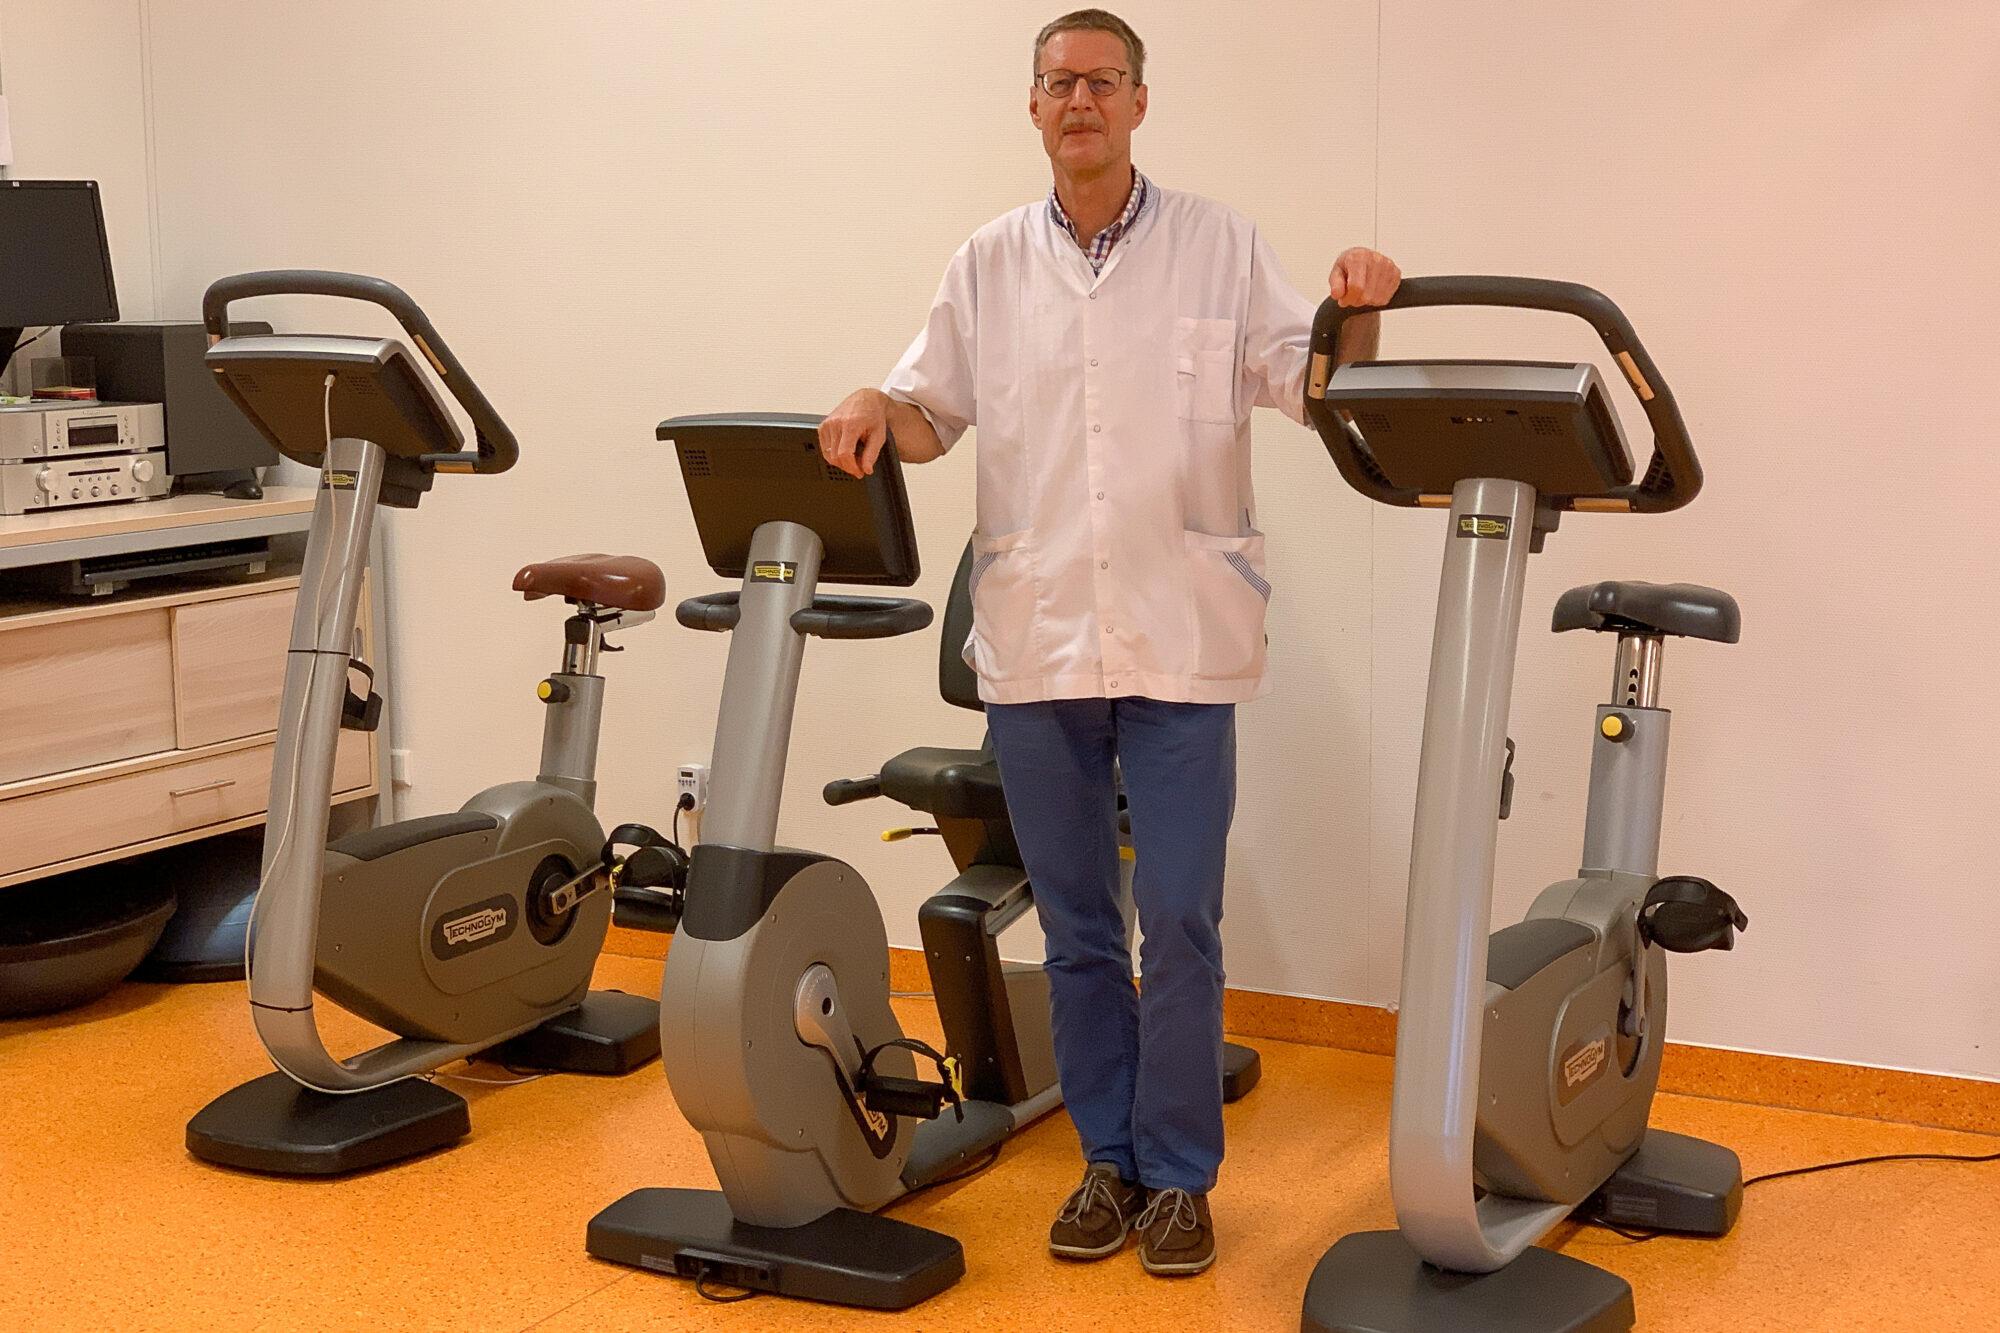 Fysio10-IJsselland helpt Covid19-patiënten